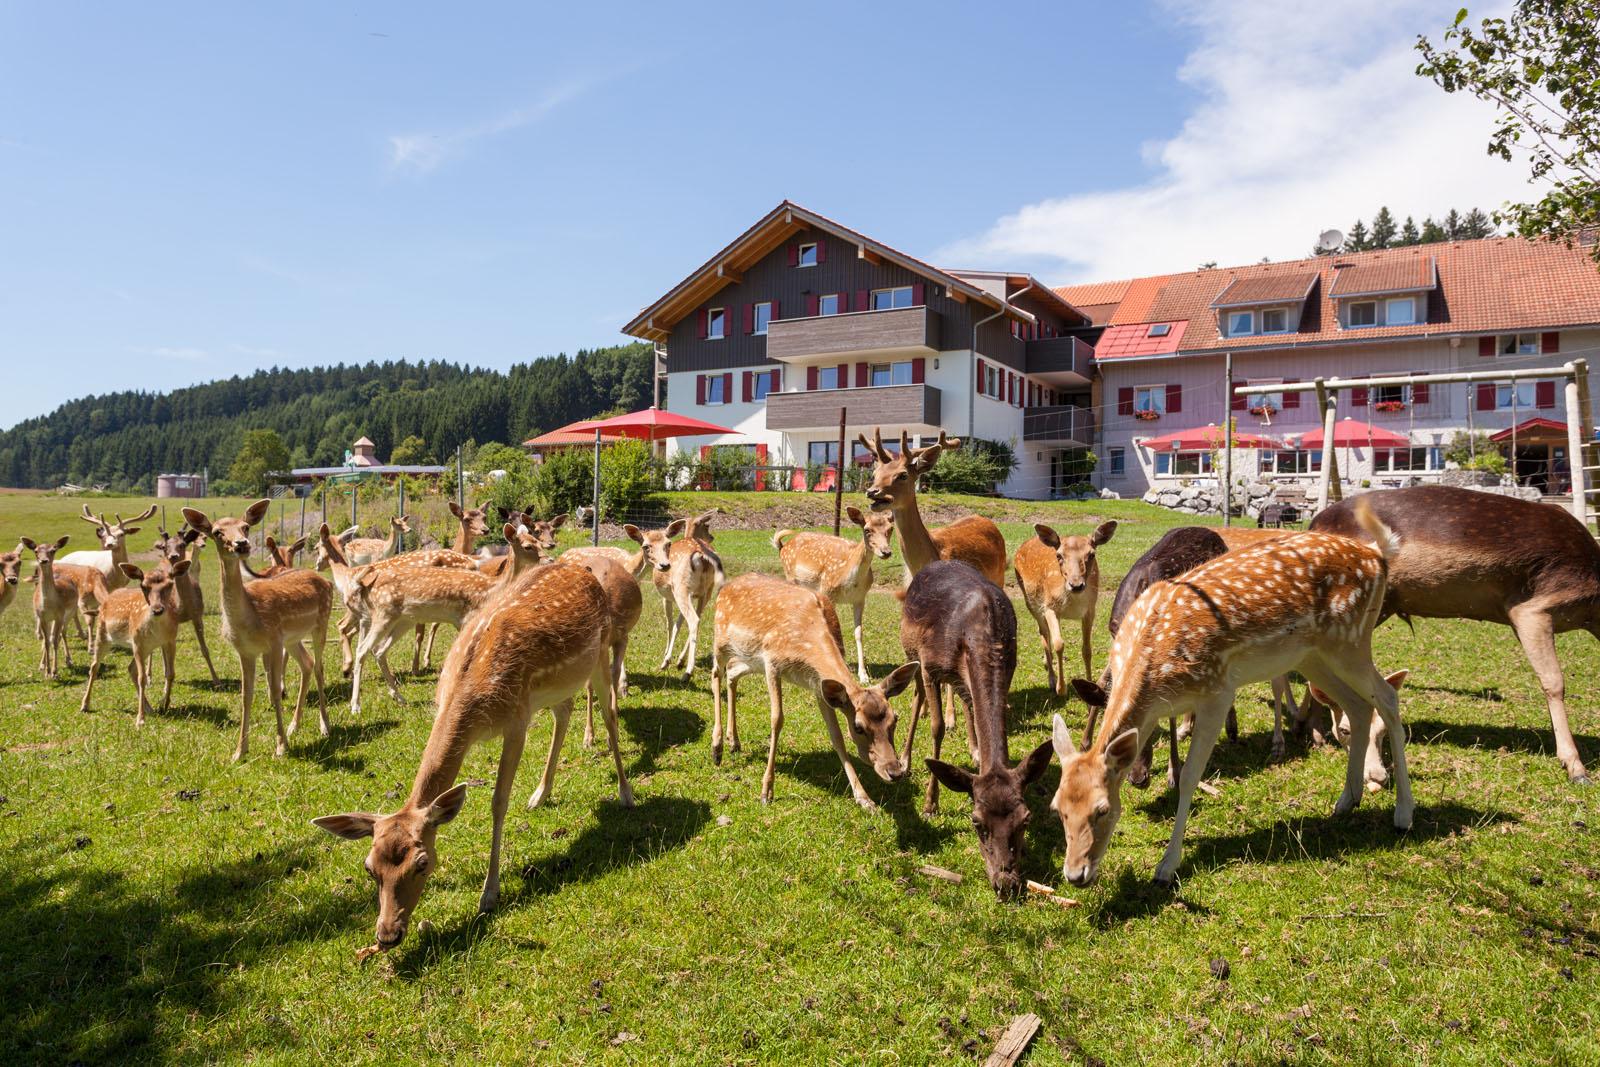 Nature hotel & Spa Sontheim - animal enclosure